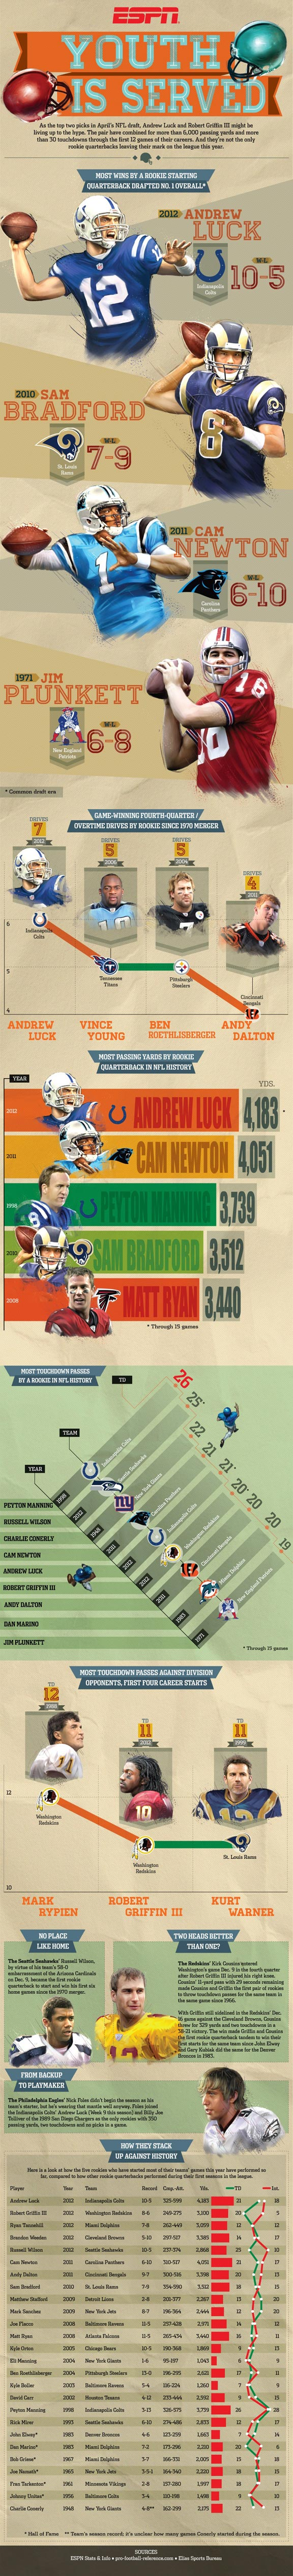 Rookie quarterbacks in 2012 infographic